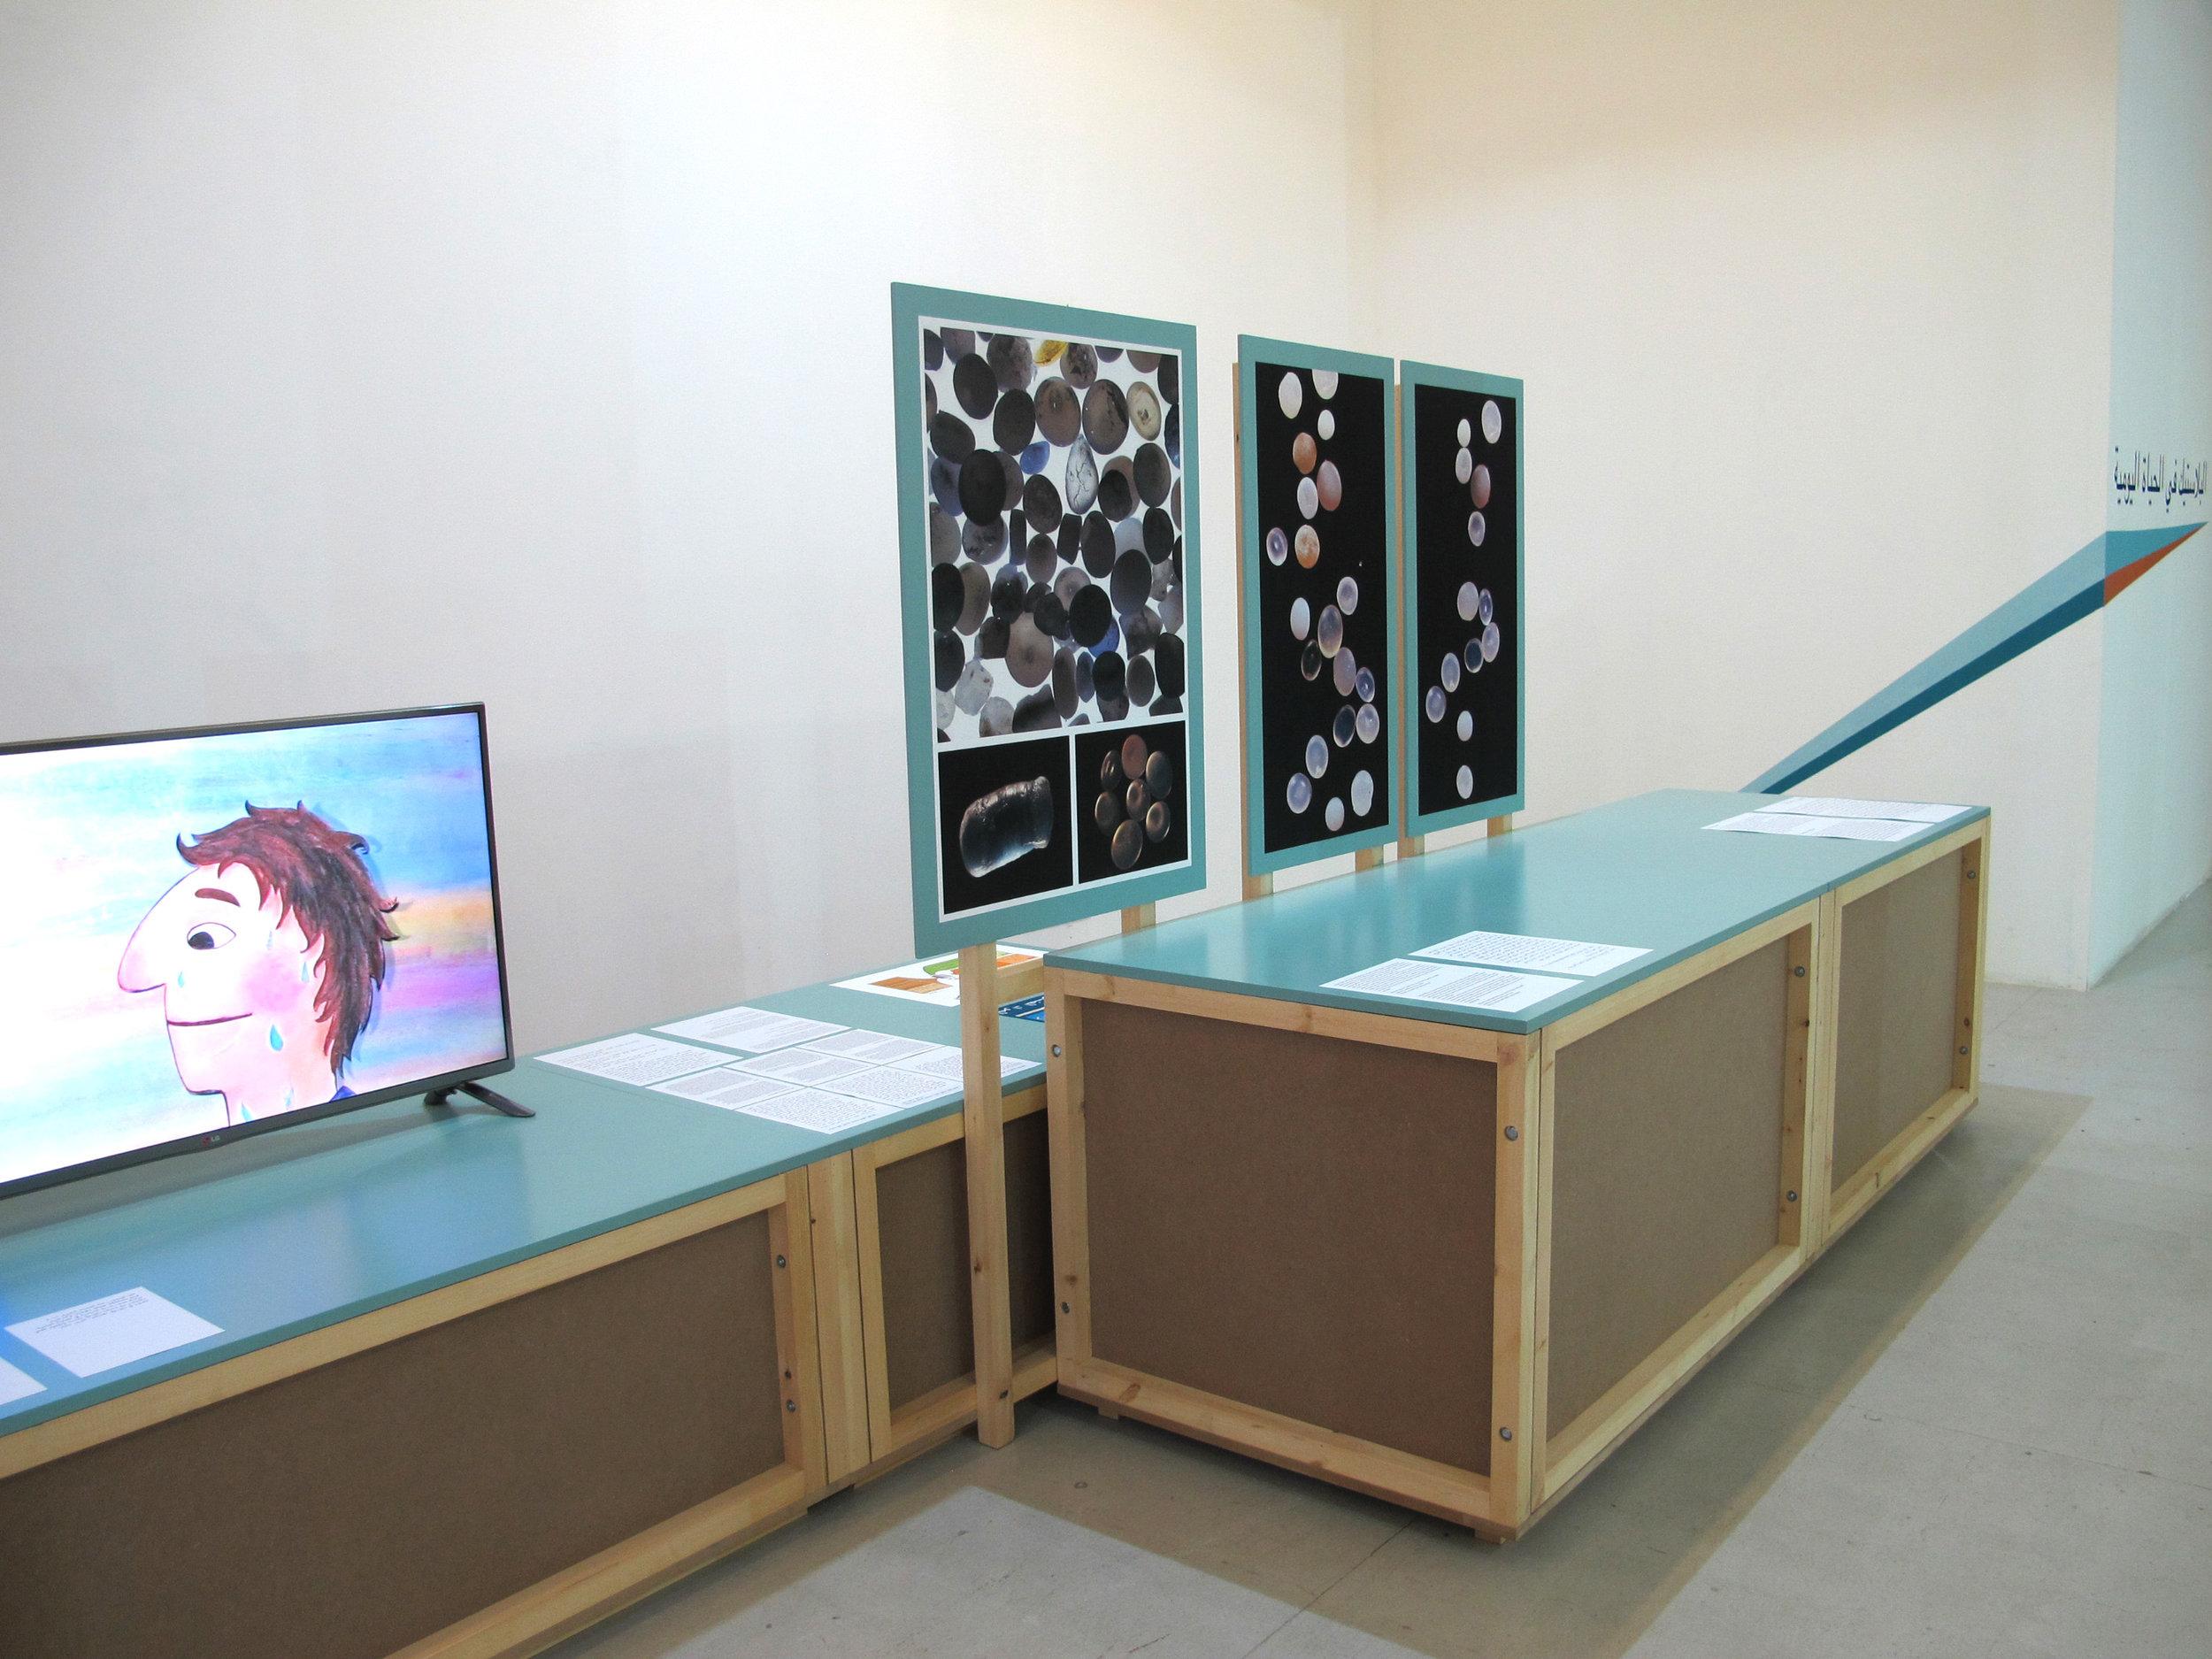 Exhibition_Lebanon_3.JPG